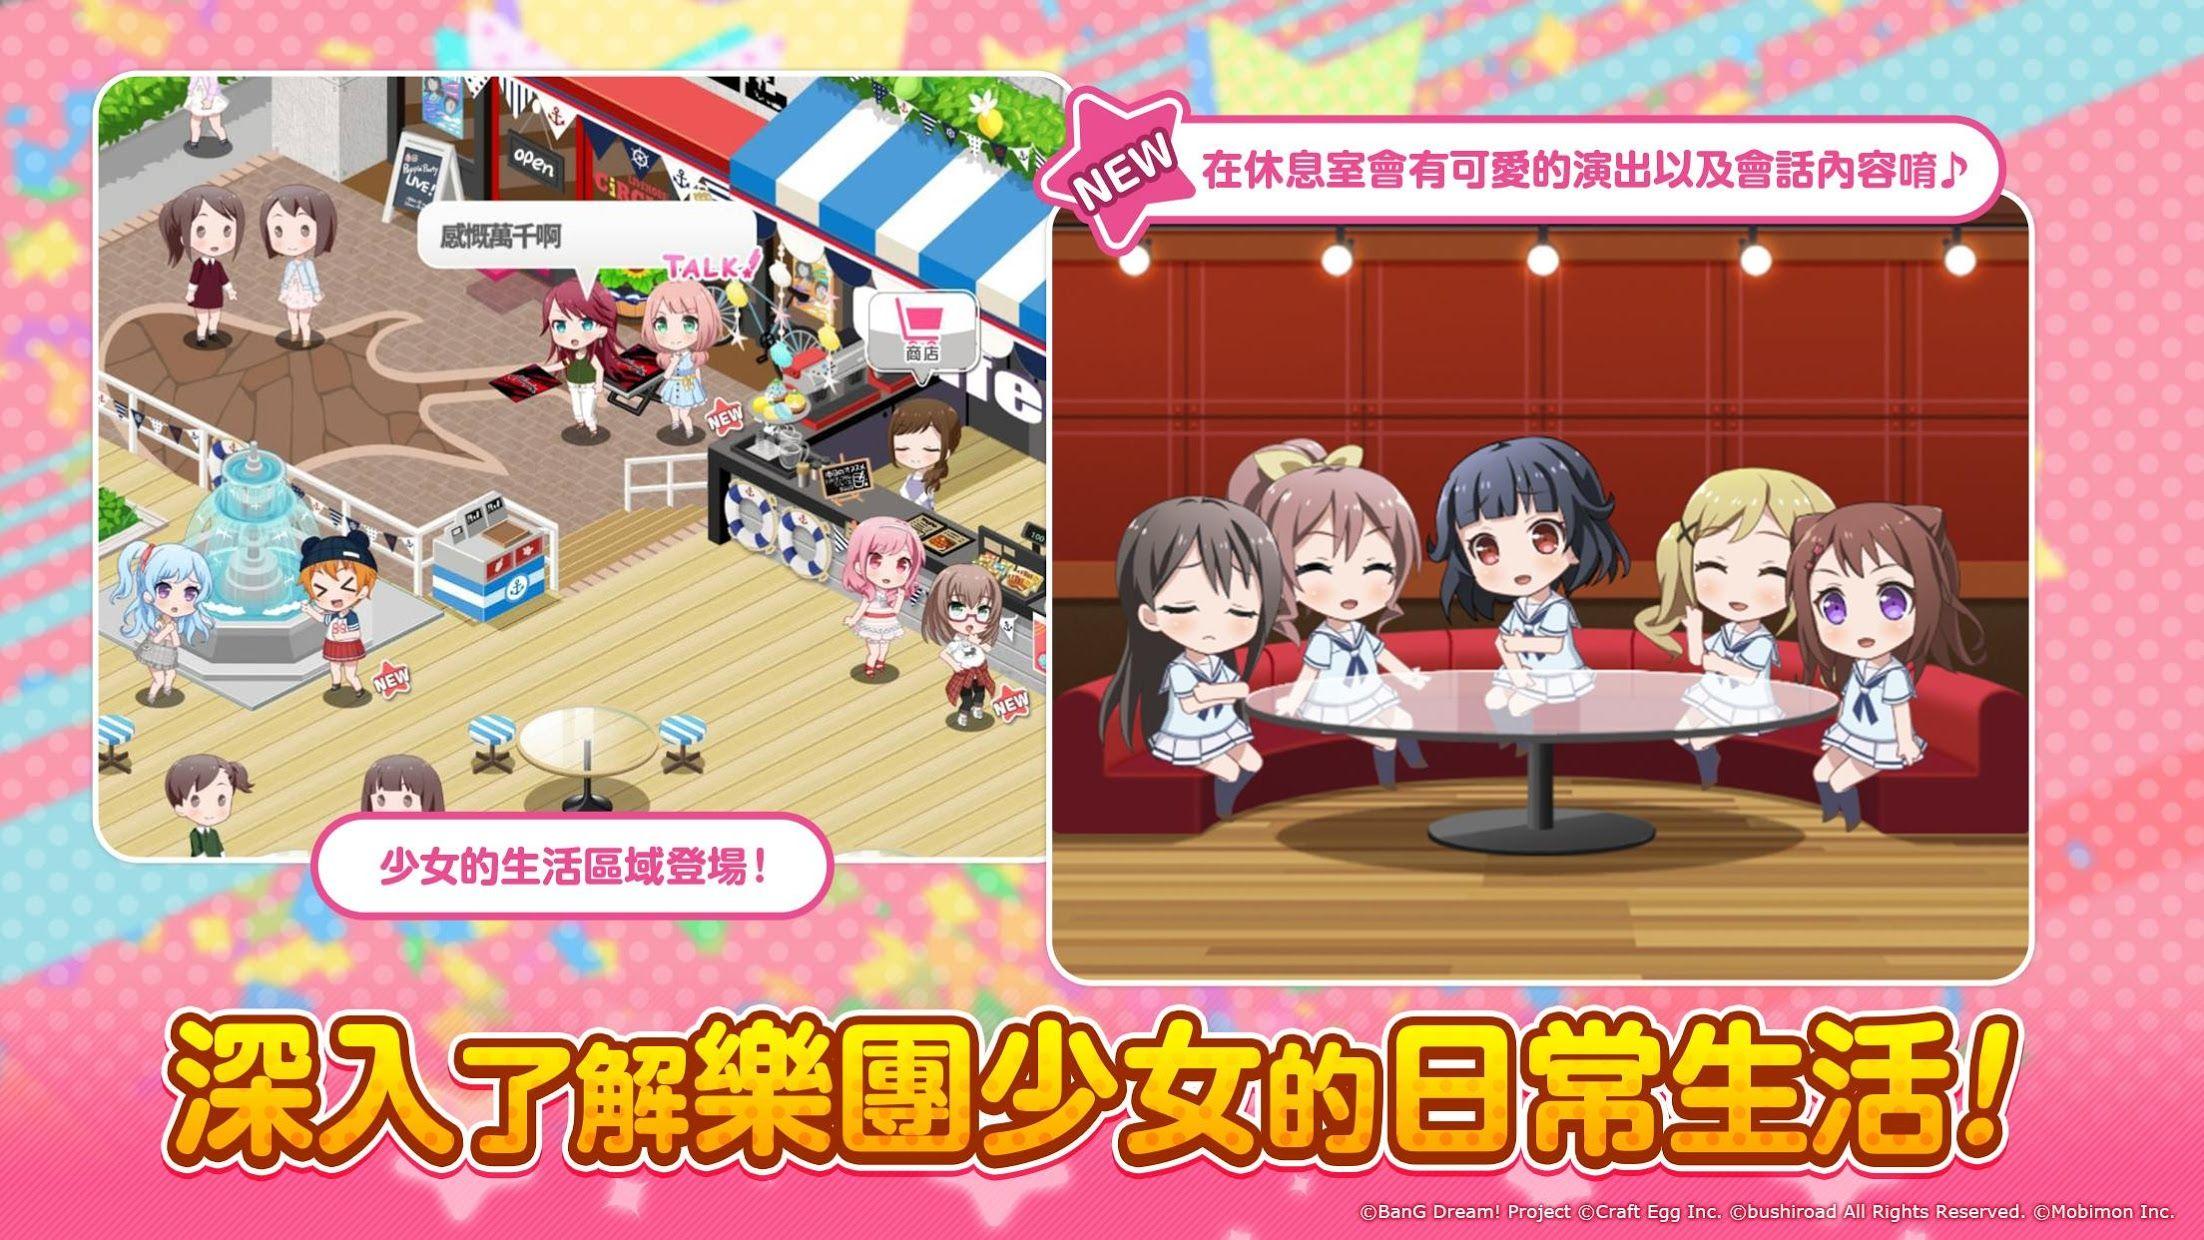 BanG Dream!少女乐团派对!(台服) 游戏截图5